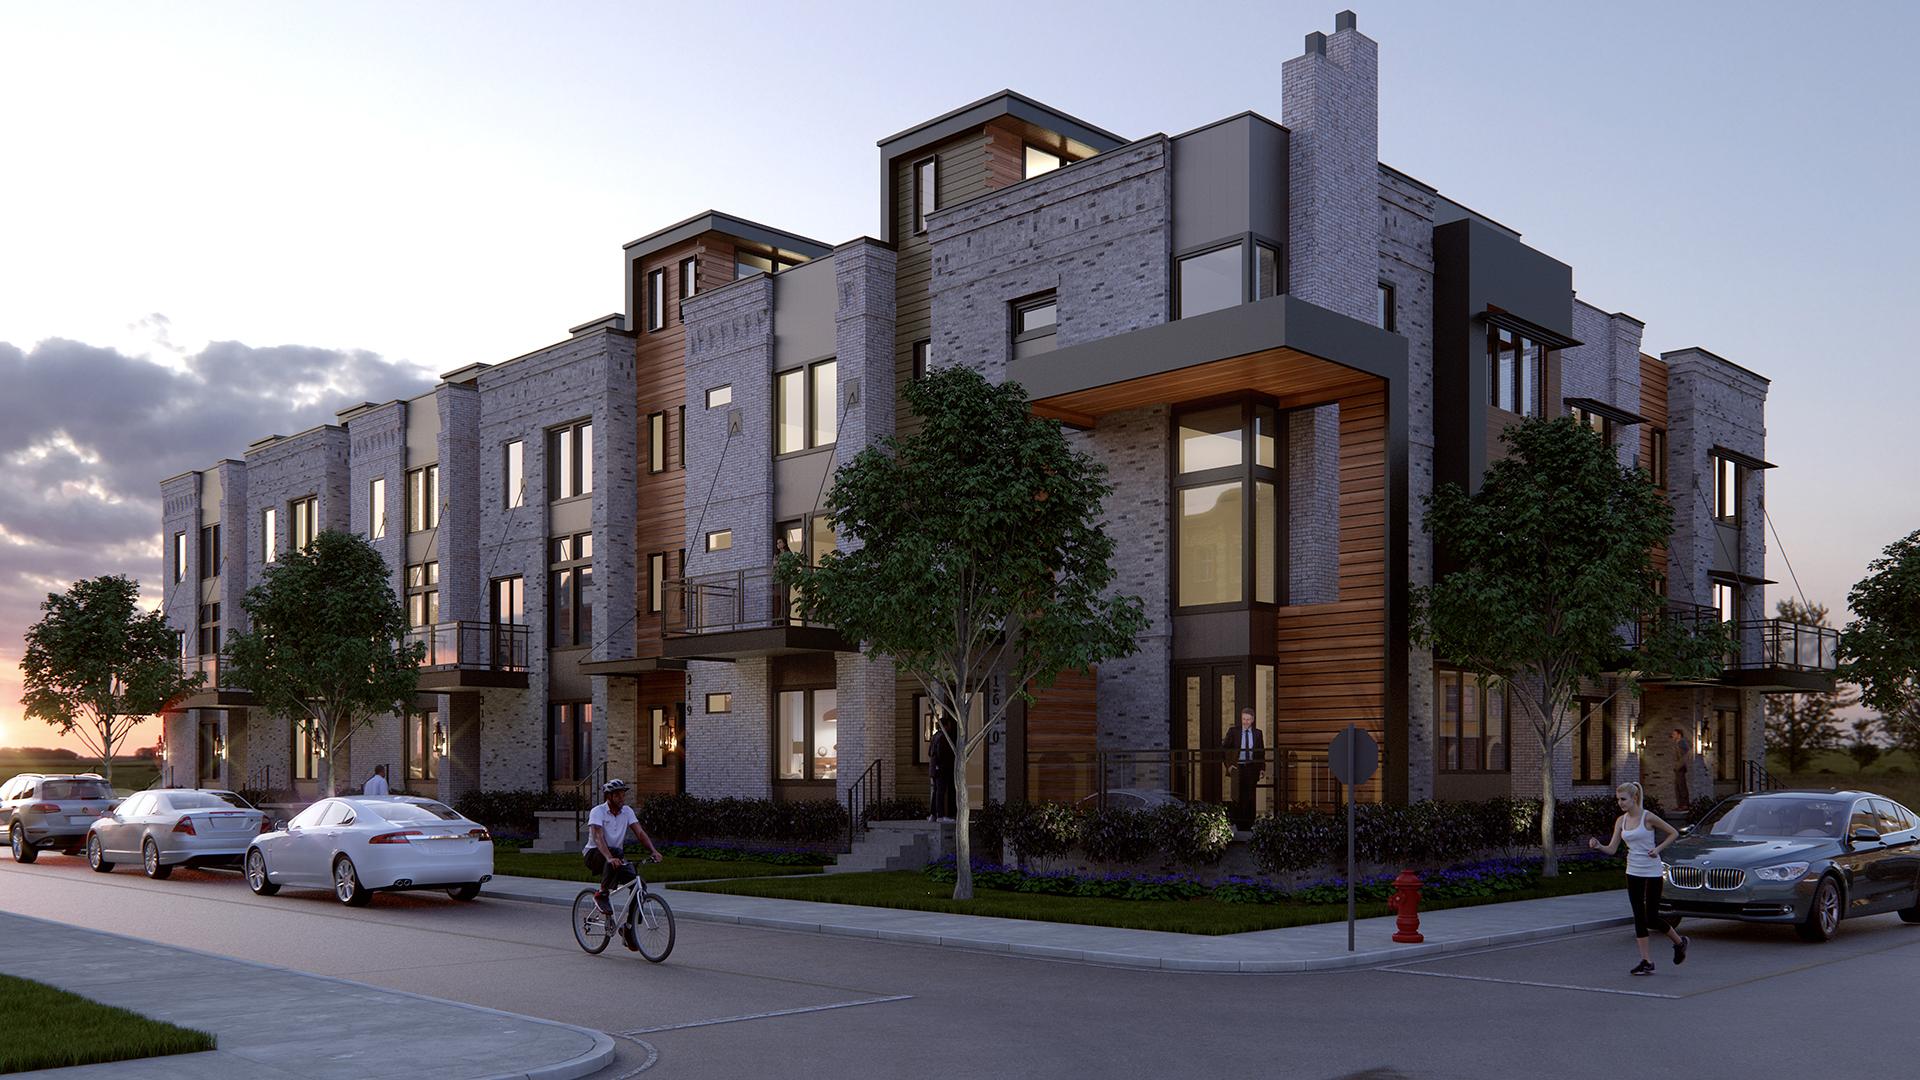 Modern Townhouse Rendering - Nigh